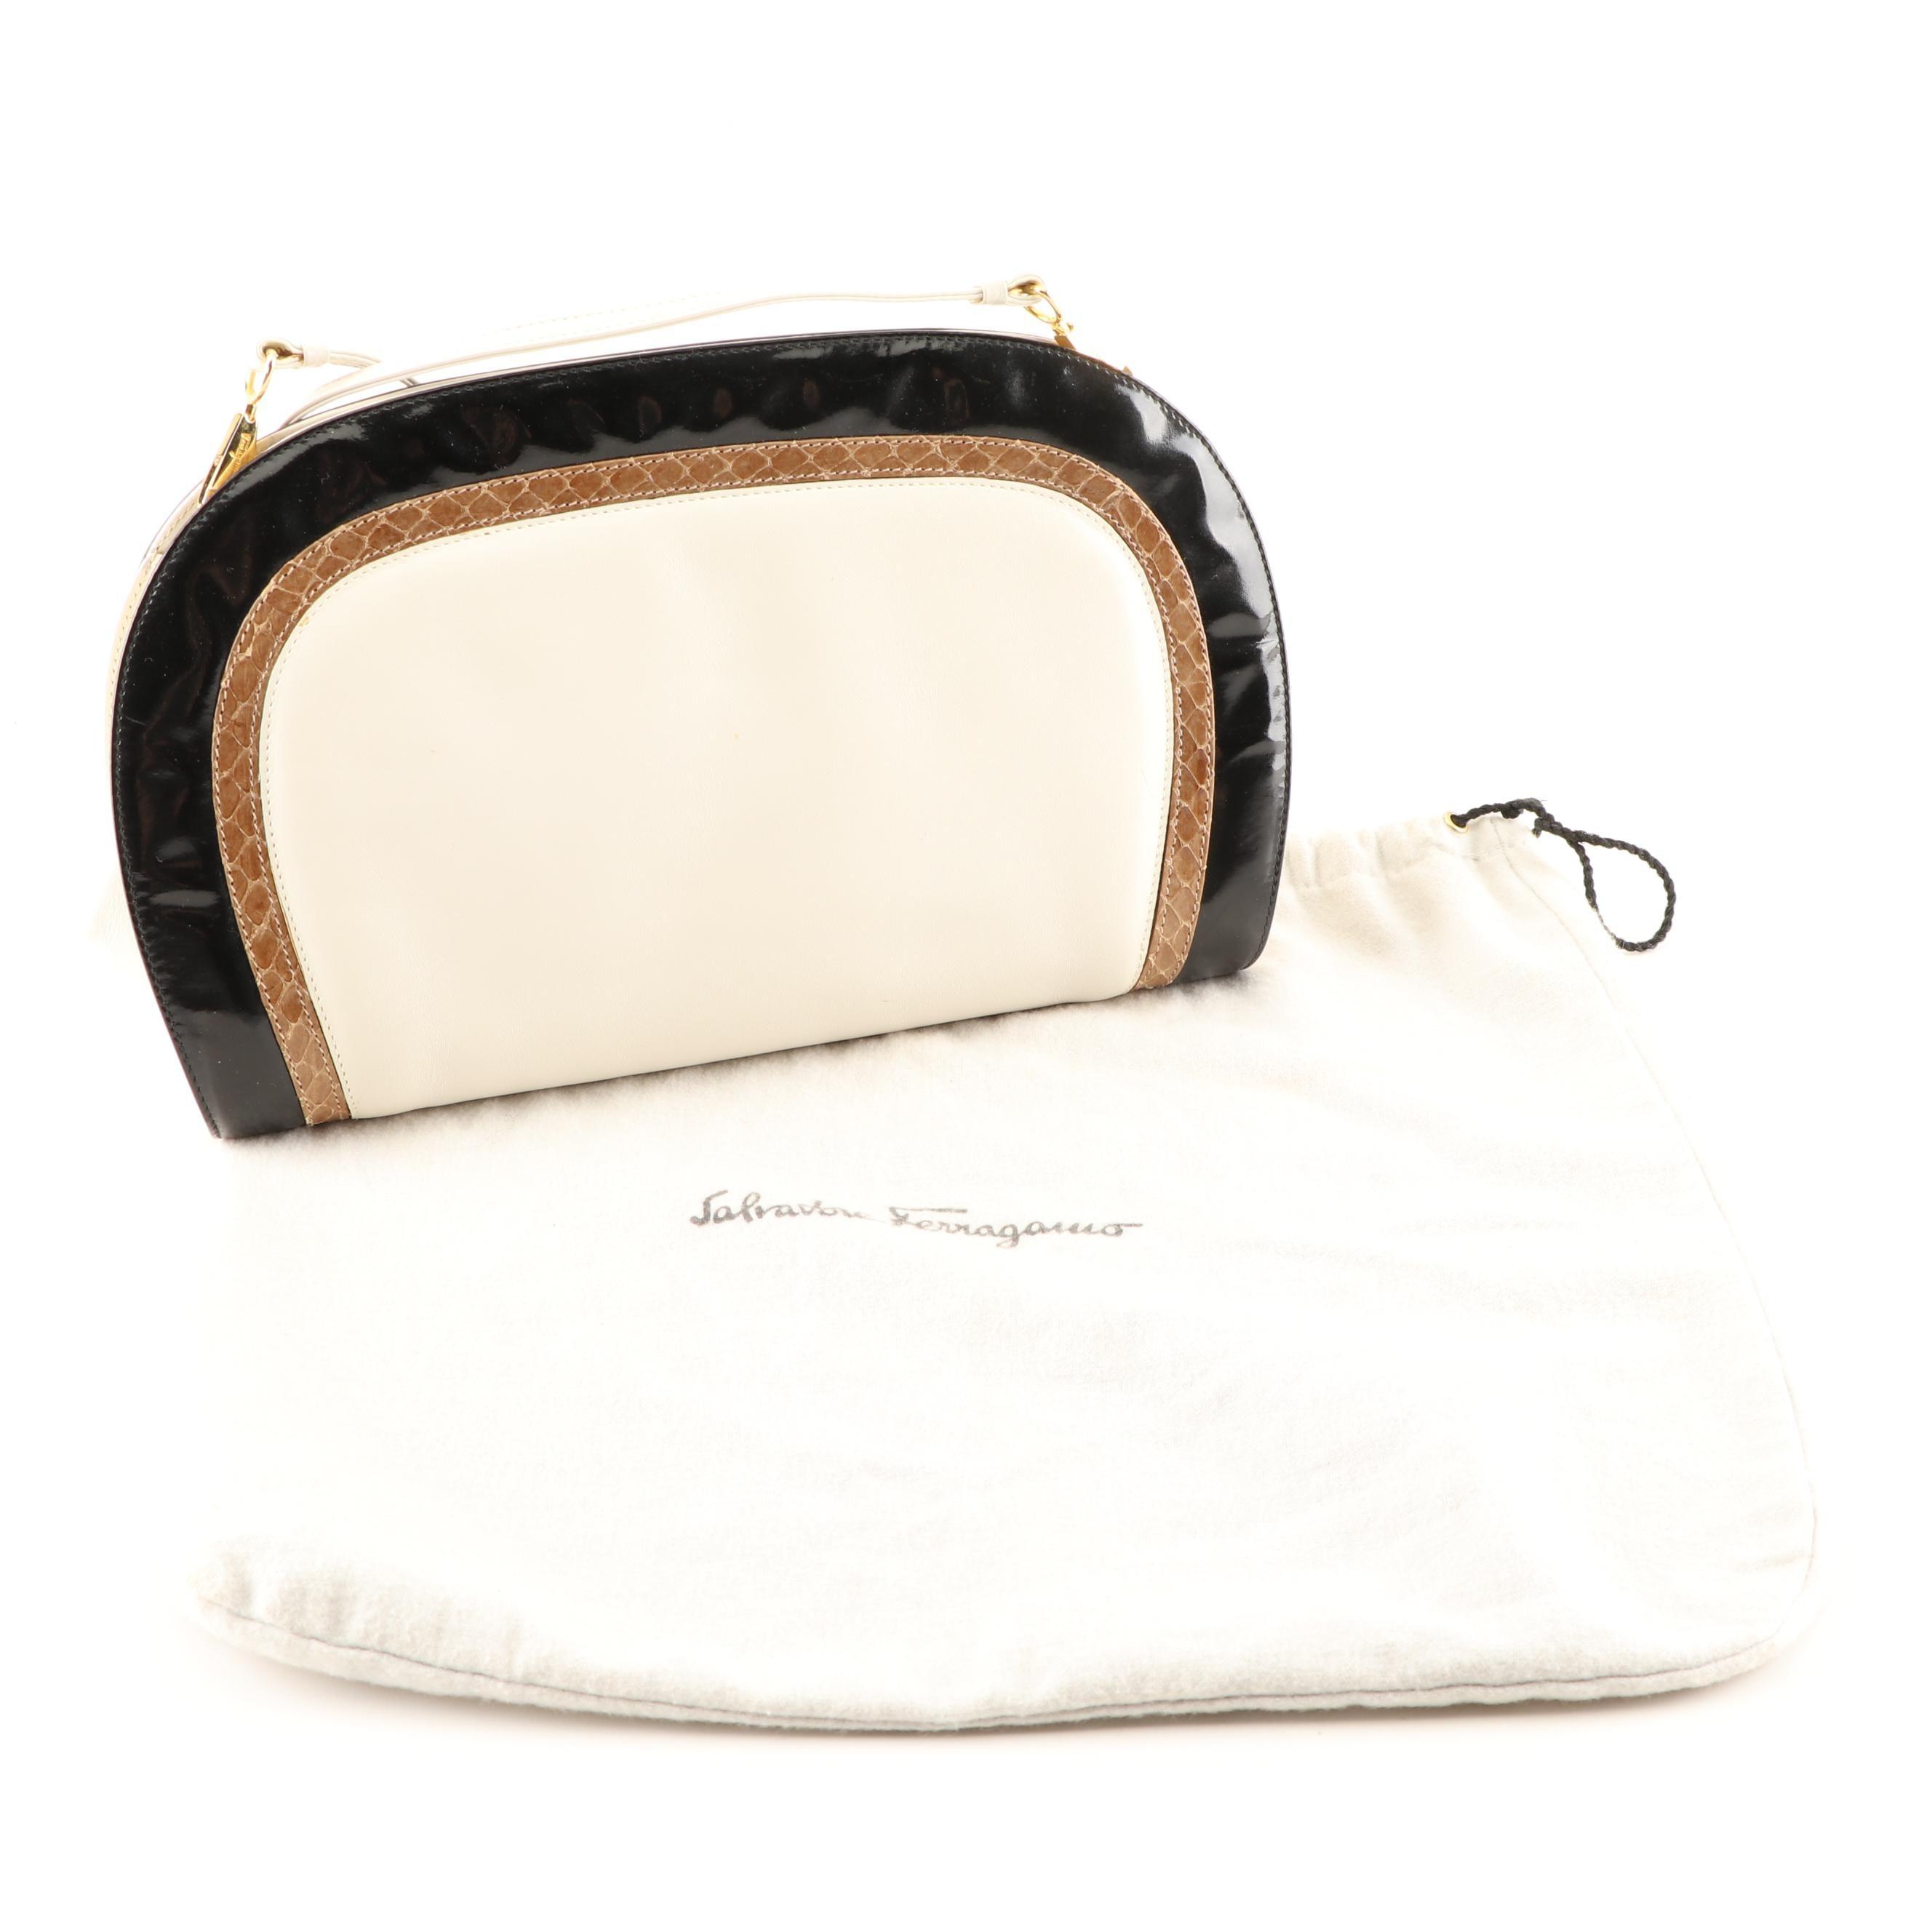 Savatore Ferragamo Ivory Leather Clutch With Tan Reptile and Black Patent Trim